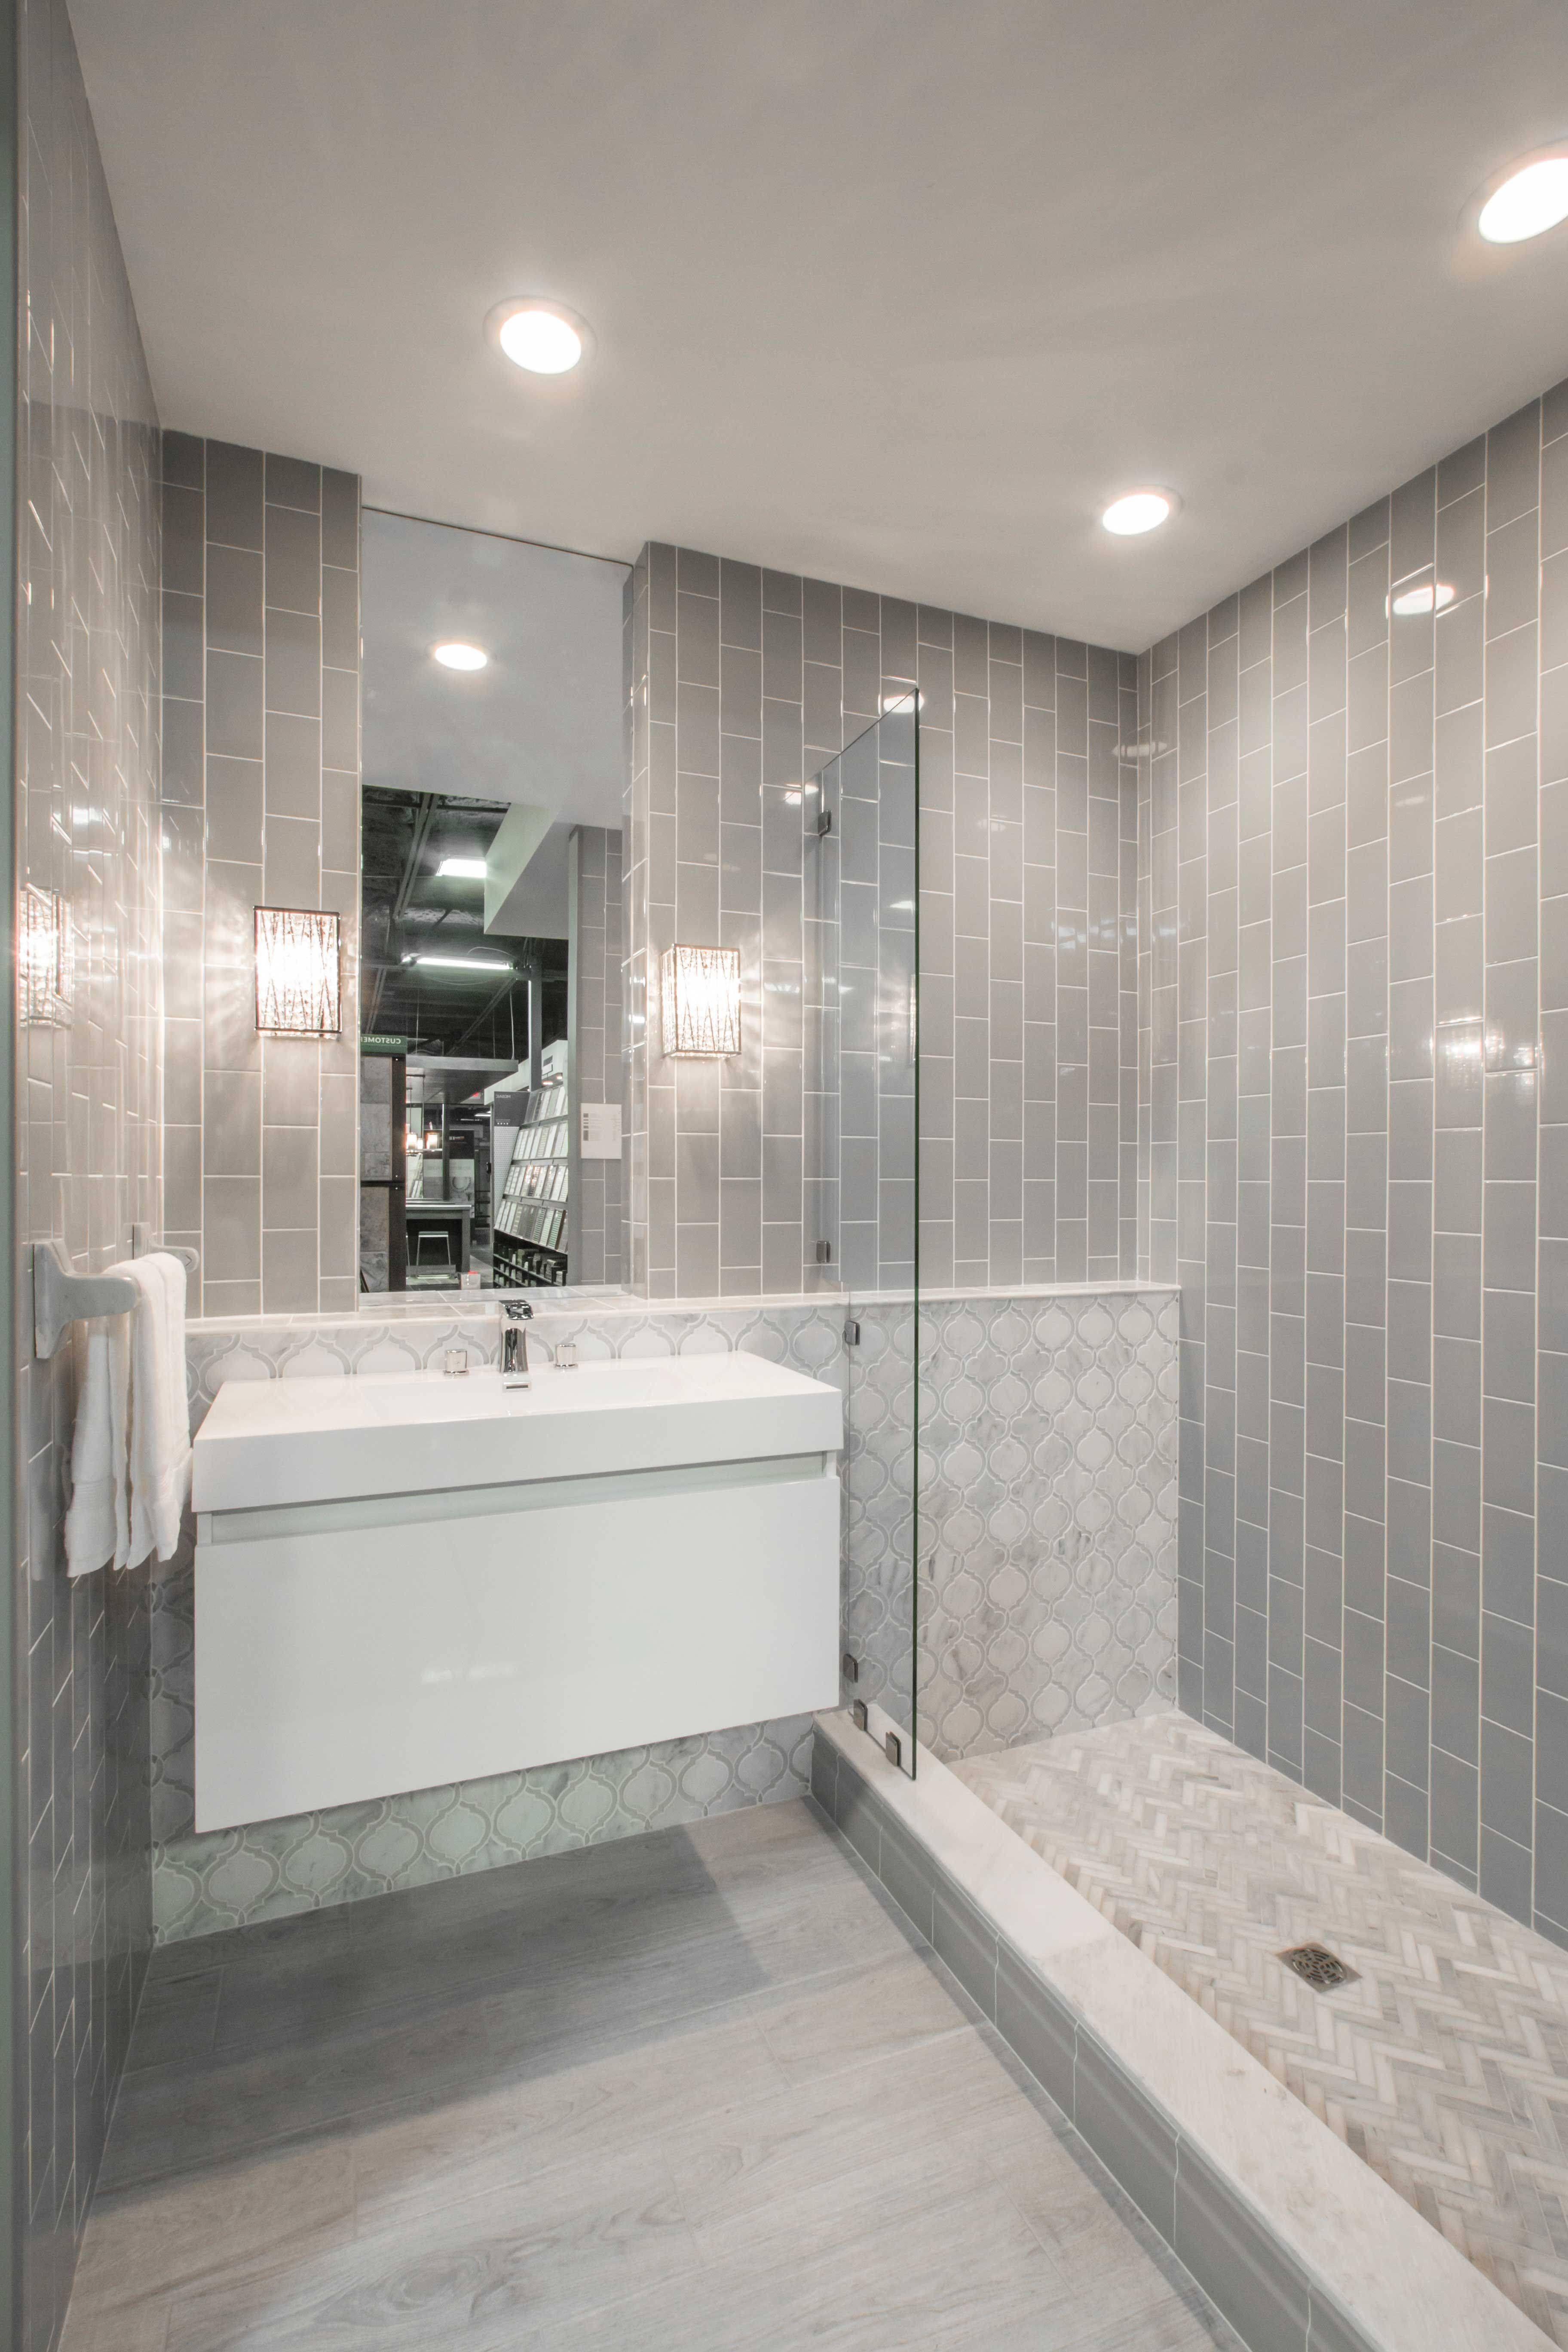 Simple Modern Bathroom Tiles Design Ideas